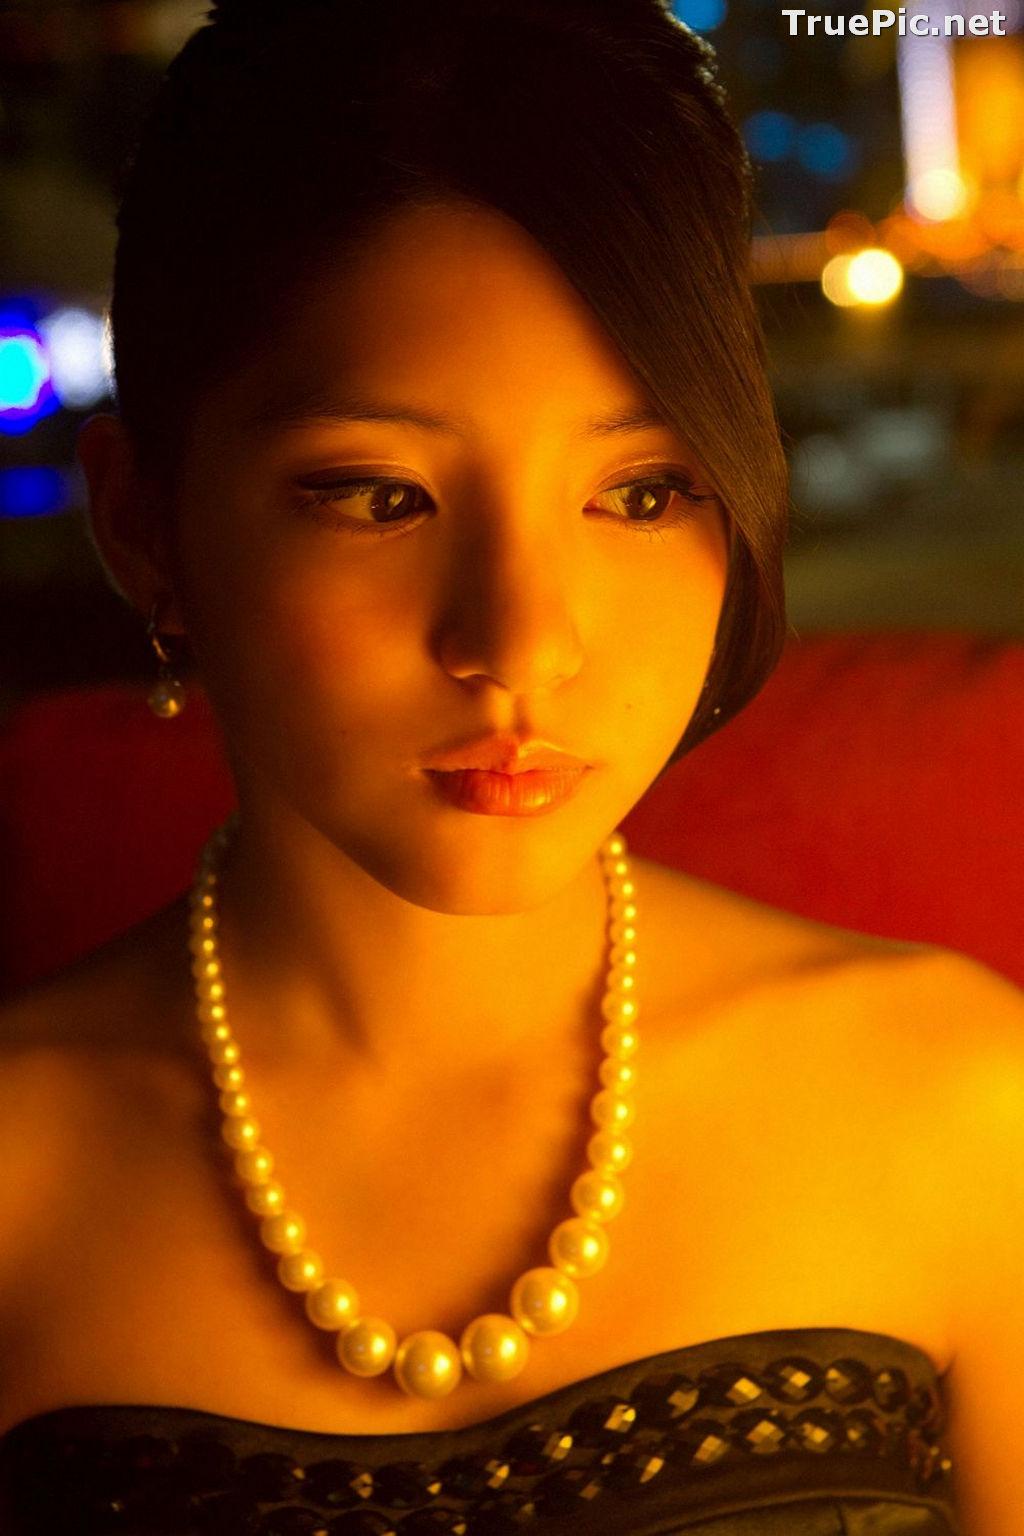 Image [YS Web] Vol.506 - Japanese Actress and Singer - Umika Kawashima - TruePic.net - Picture-14